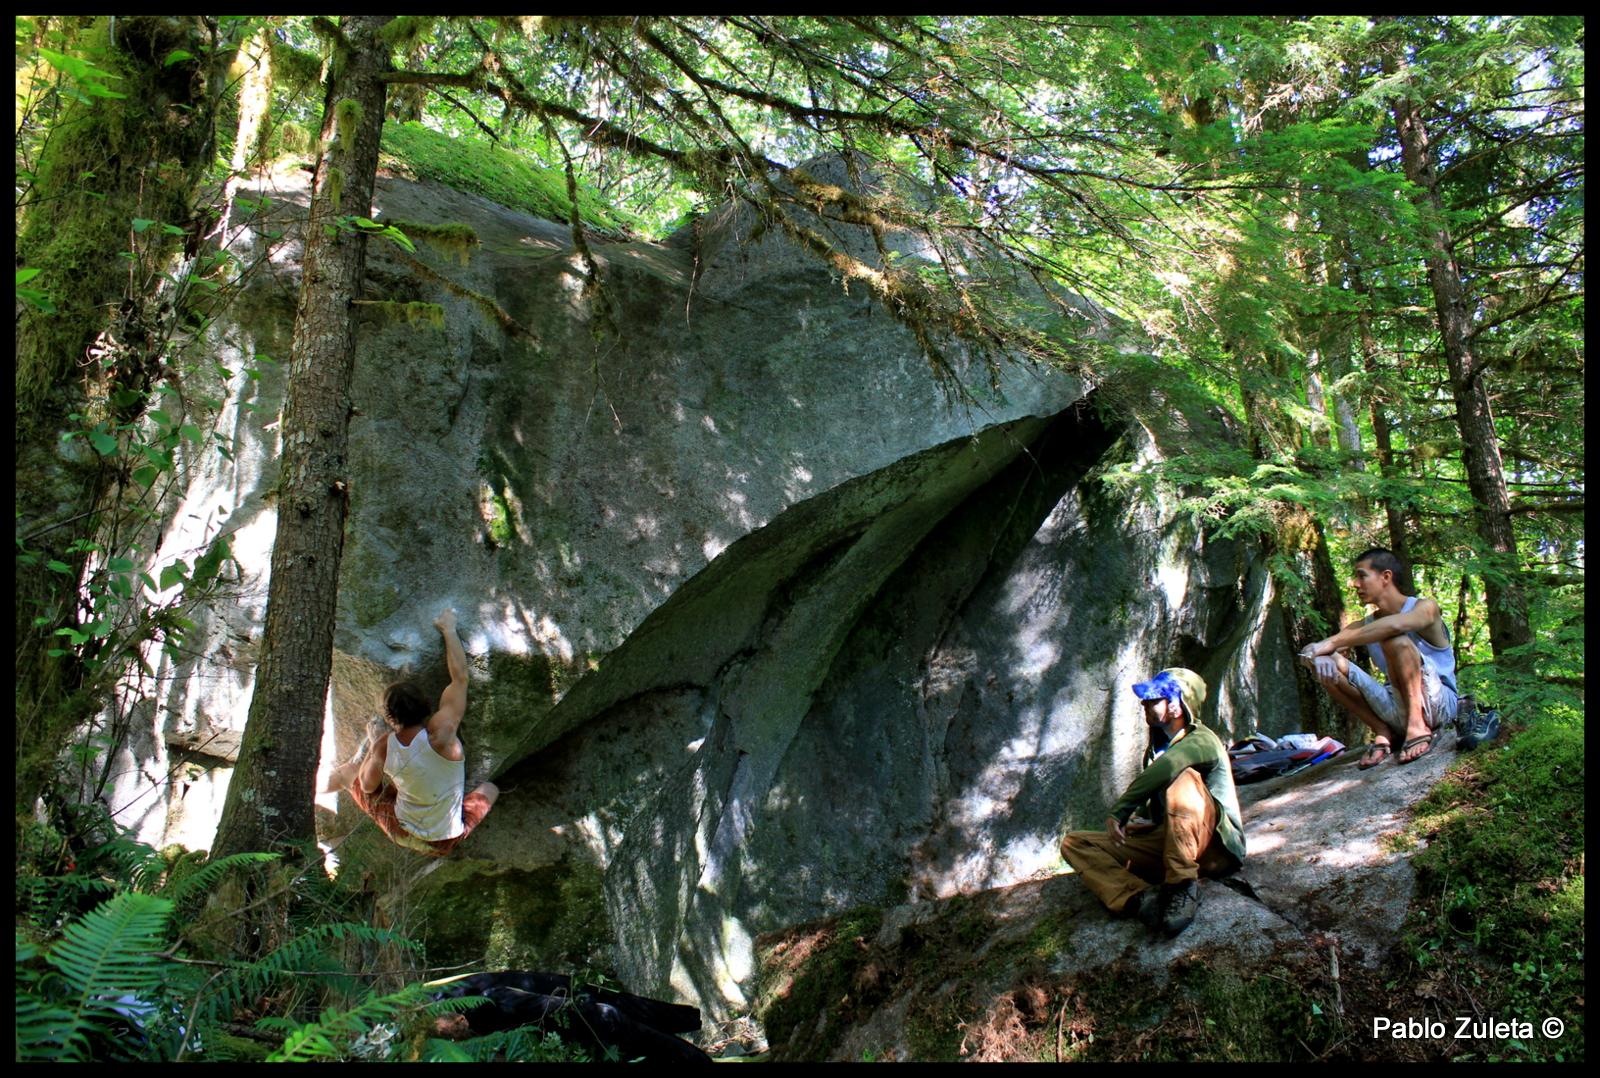 Miles Berkey climbing a new boulder Ben Shrope located.